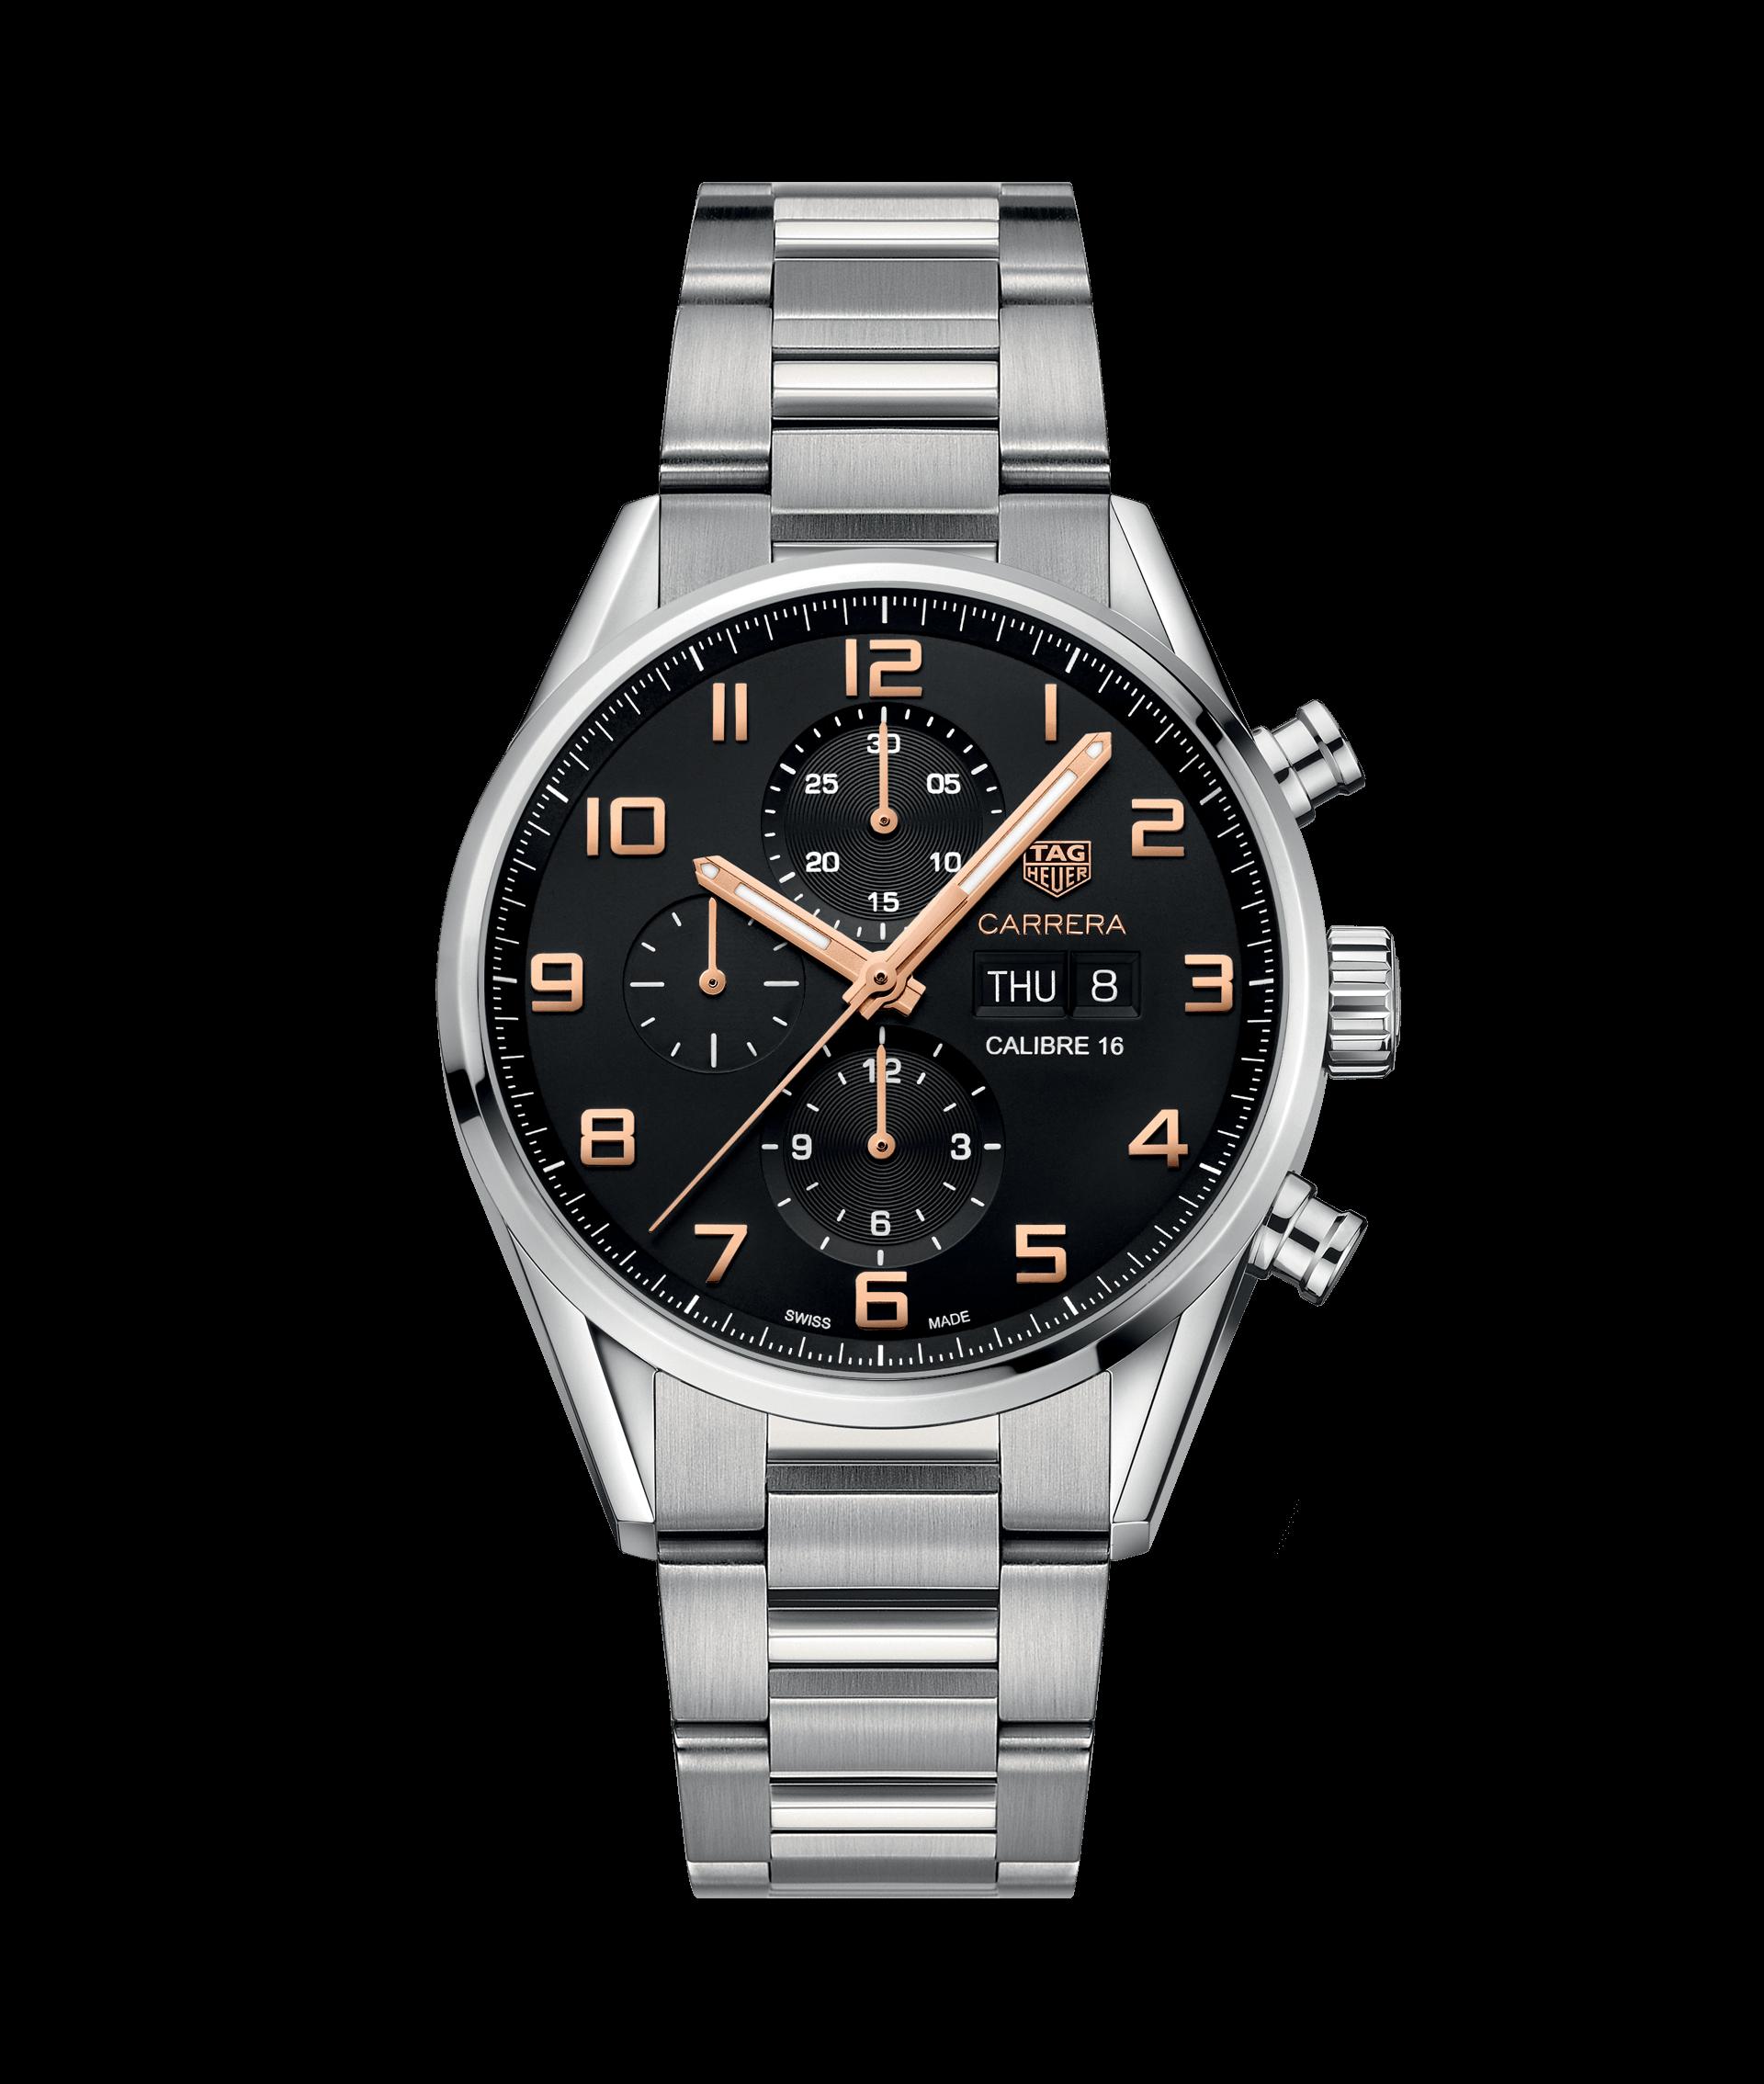 1fdd0131e62 Mens Replica Tag Heuer – Tag Heuer Replica Watches – Best Luxury ...